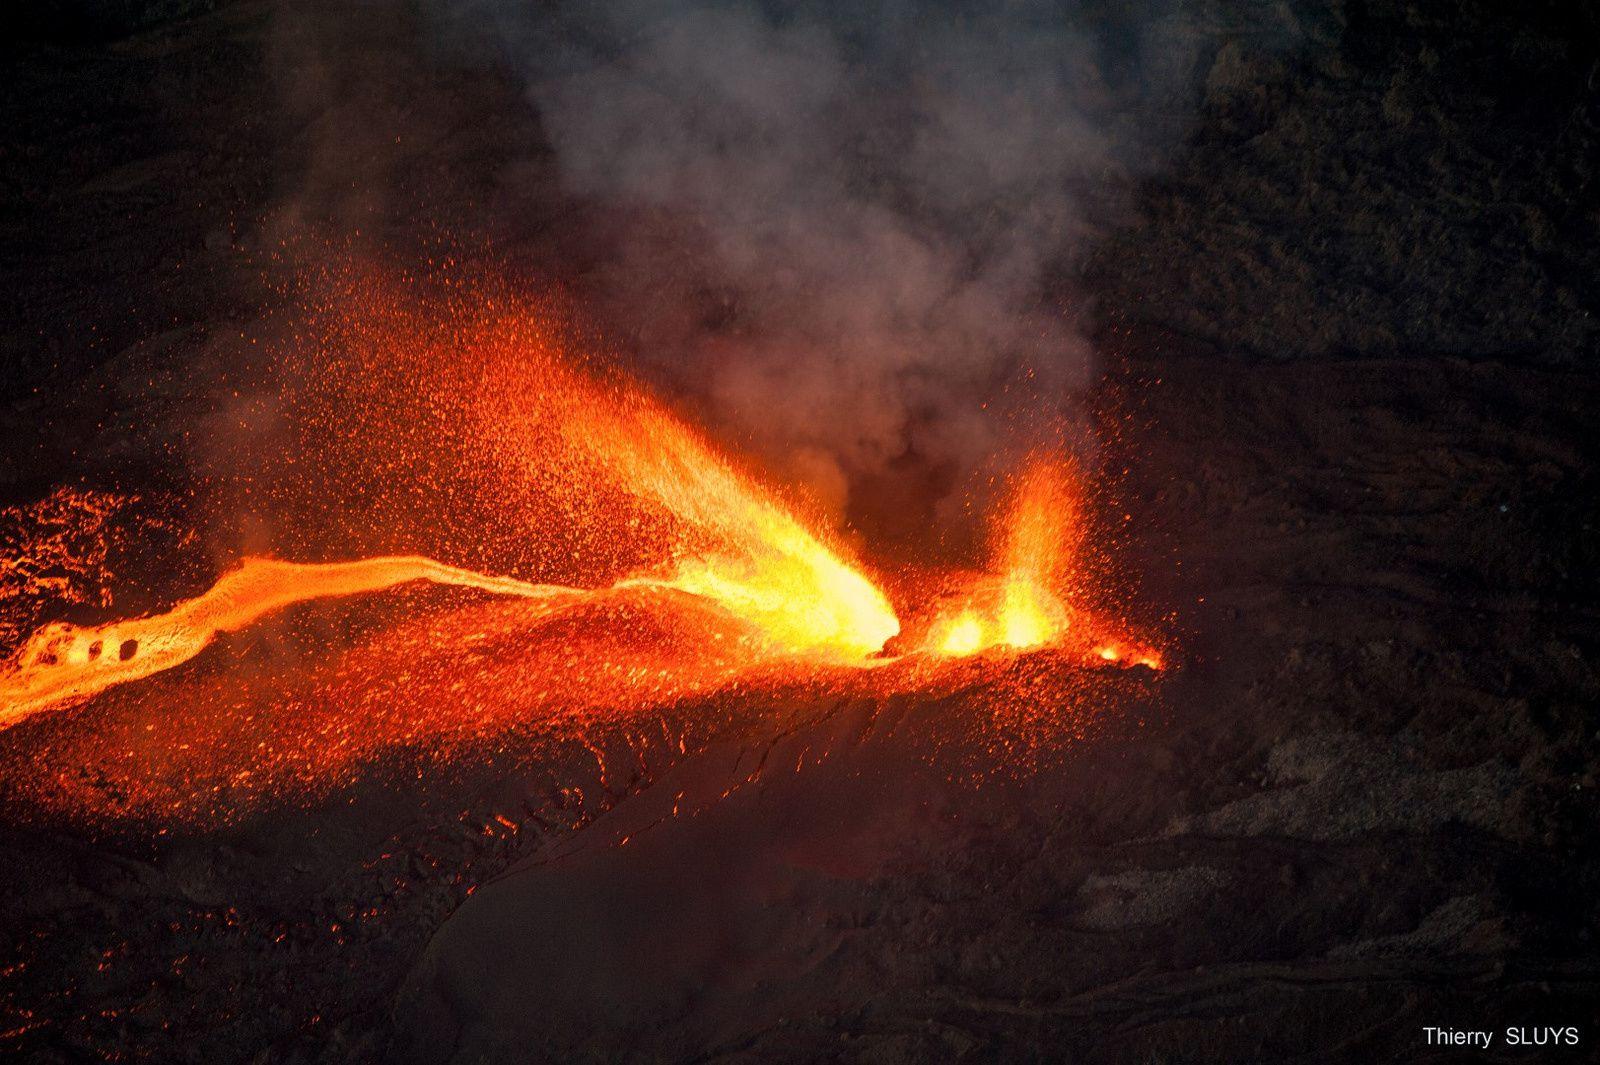 Piton de La Fournaise - lava fountains 01.02.2017 / 6h - photo Thierry Sluys